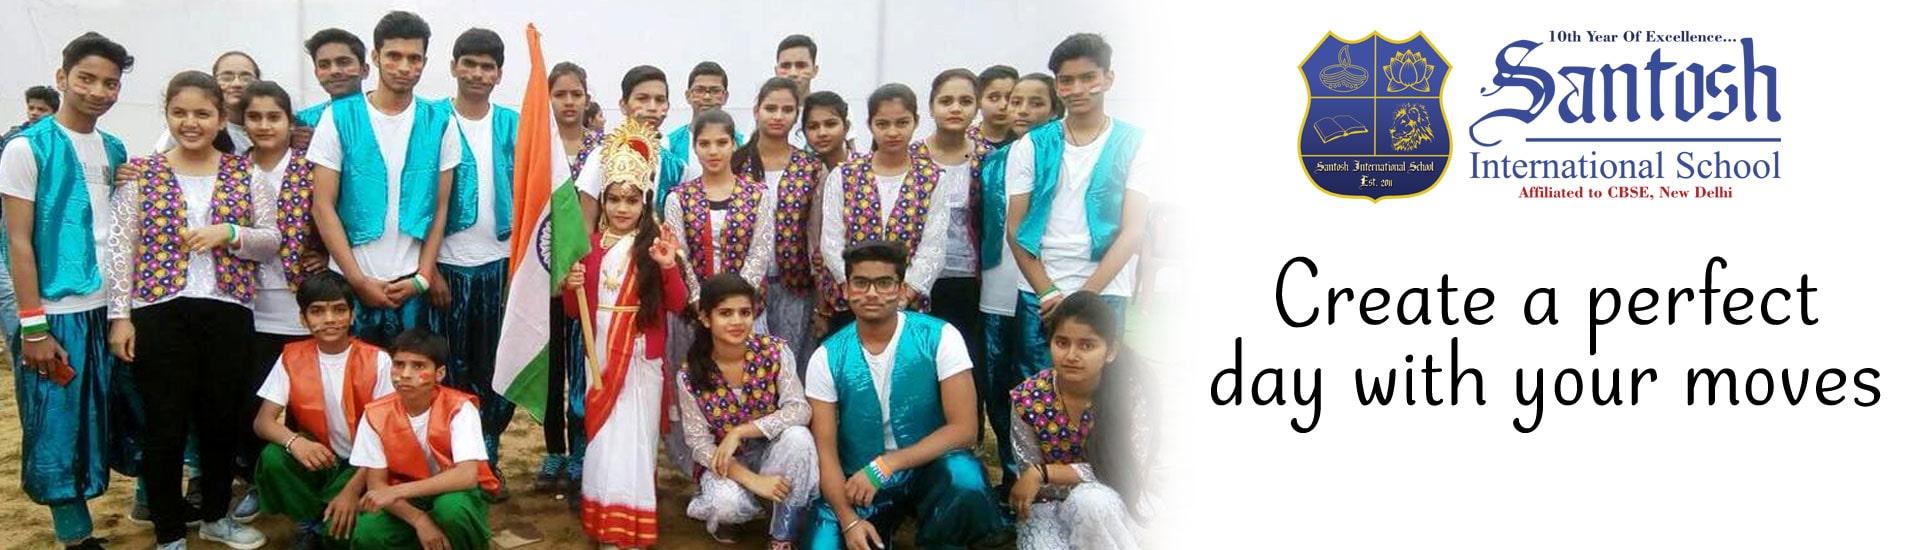 santosh international school function